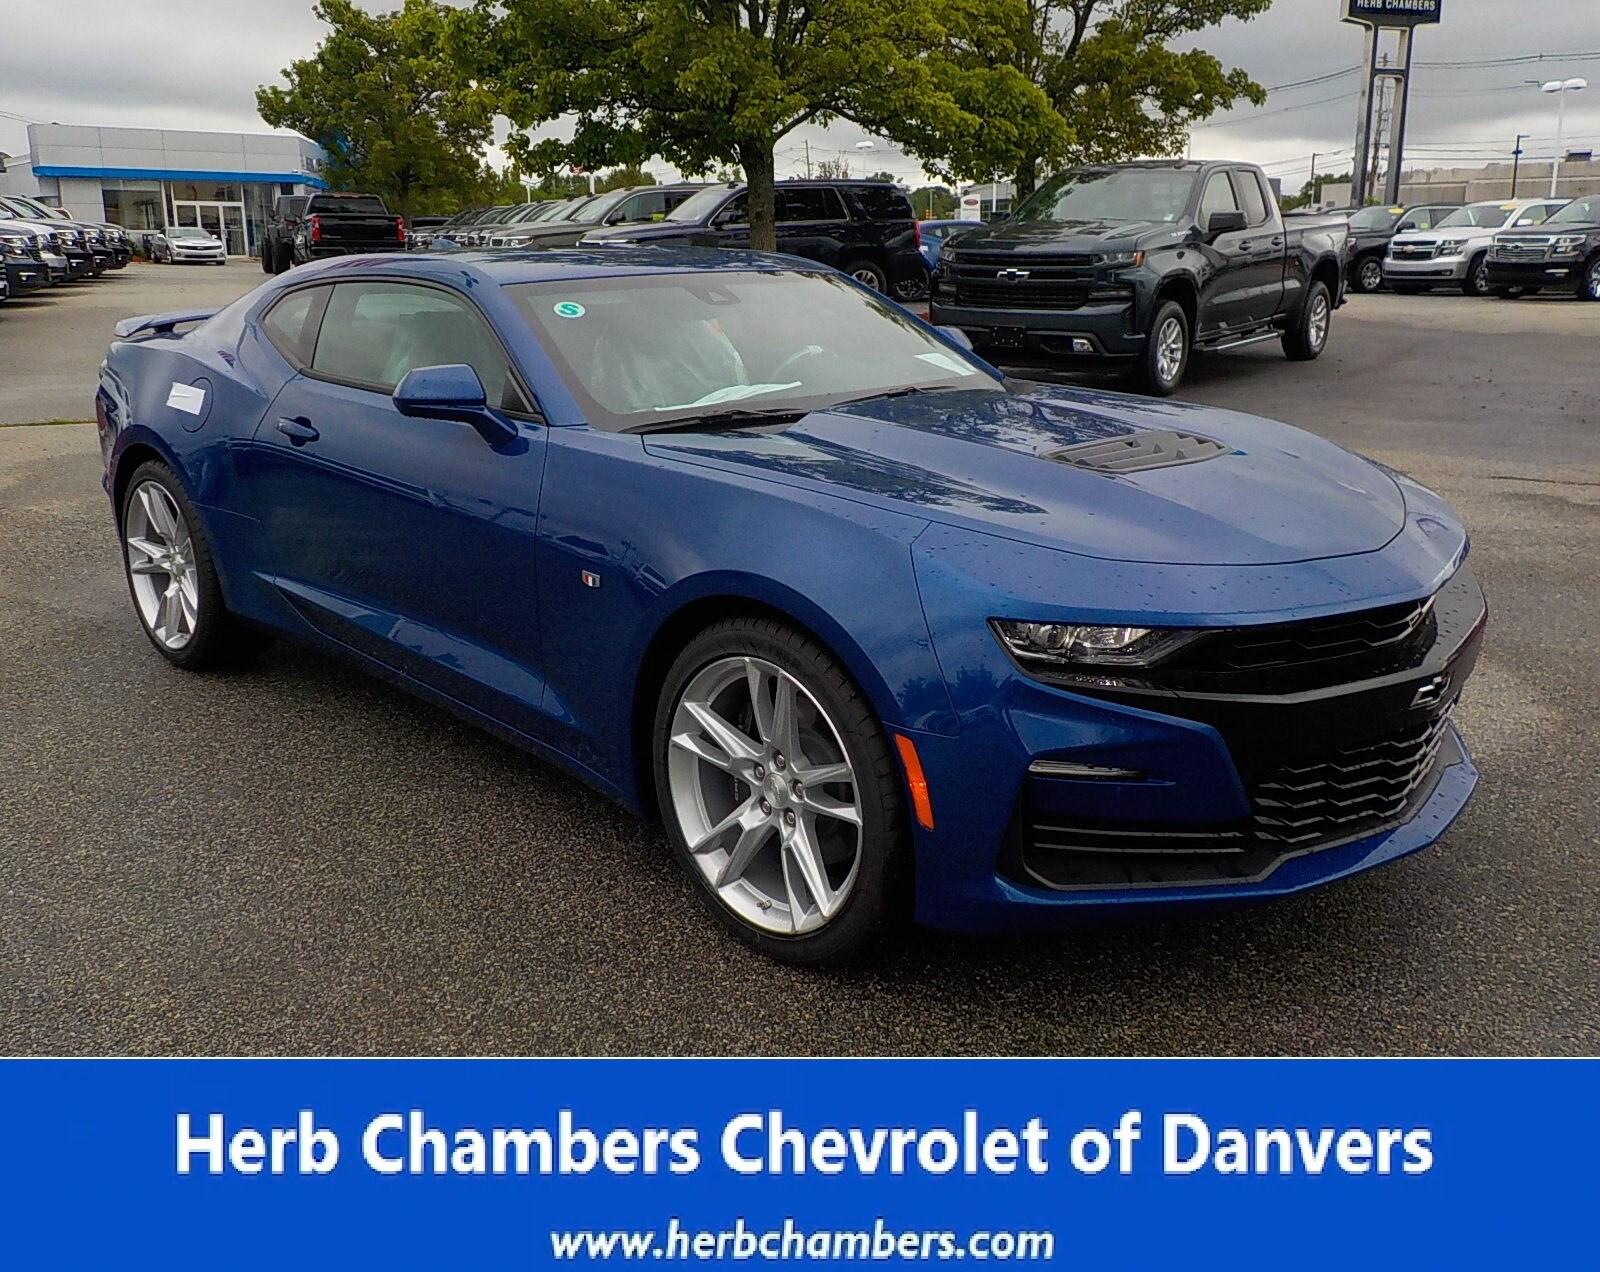 Chevrolet Camaro in Danvers & Wakefield, MA | Herb Chambers Chevrolet